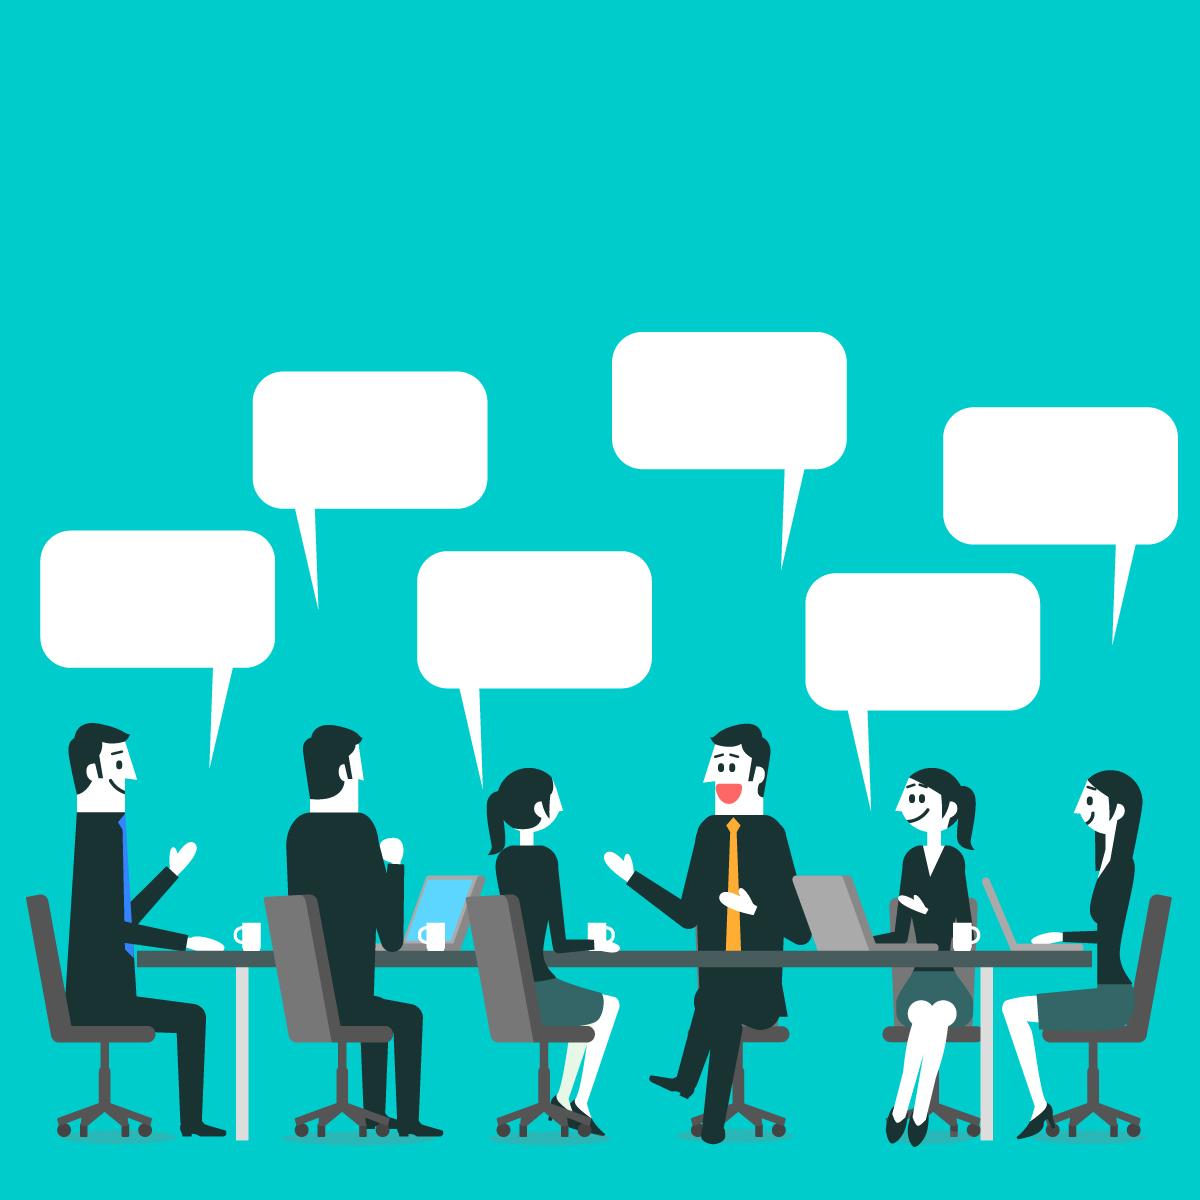 Kỹ năng giao tiếp hiệu quả